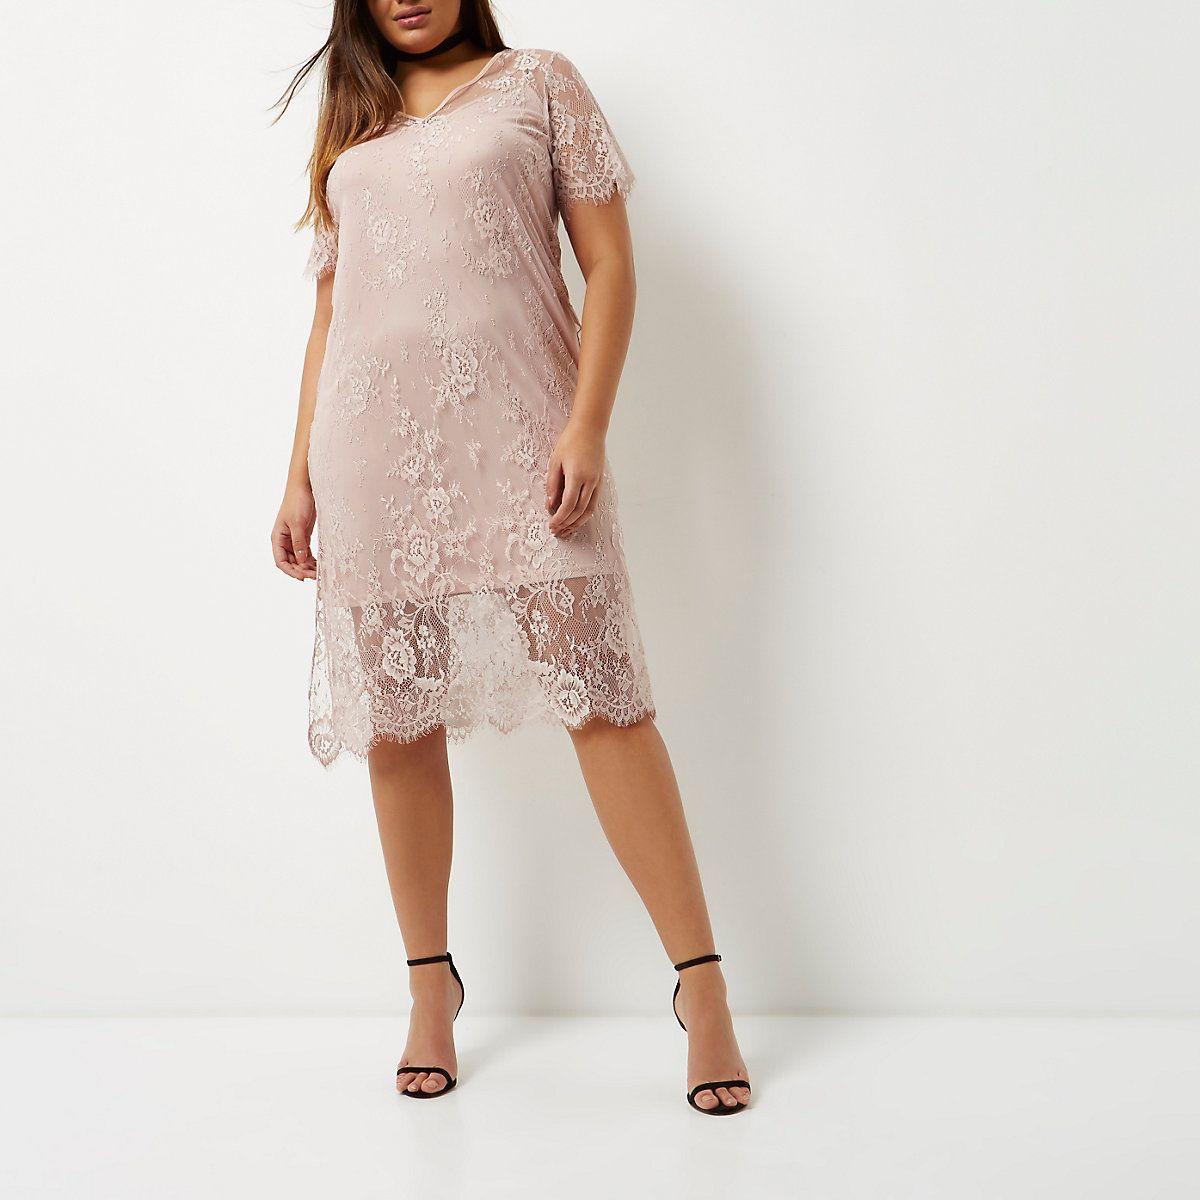 Plus Light Pink Lace Dress Light Pink Lace Dress Lace Pink Dress Dresses [ 1200 x 1200 Pixel ]